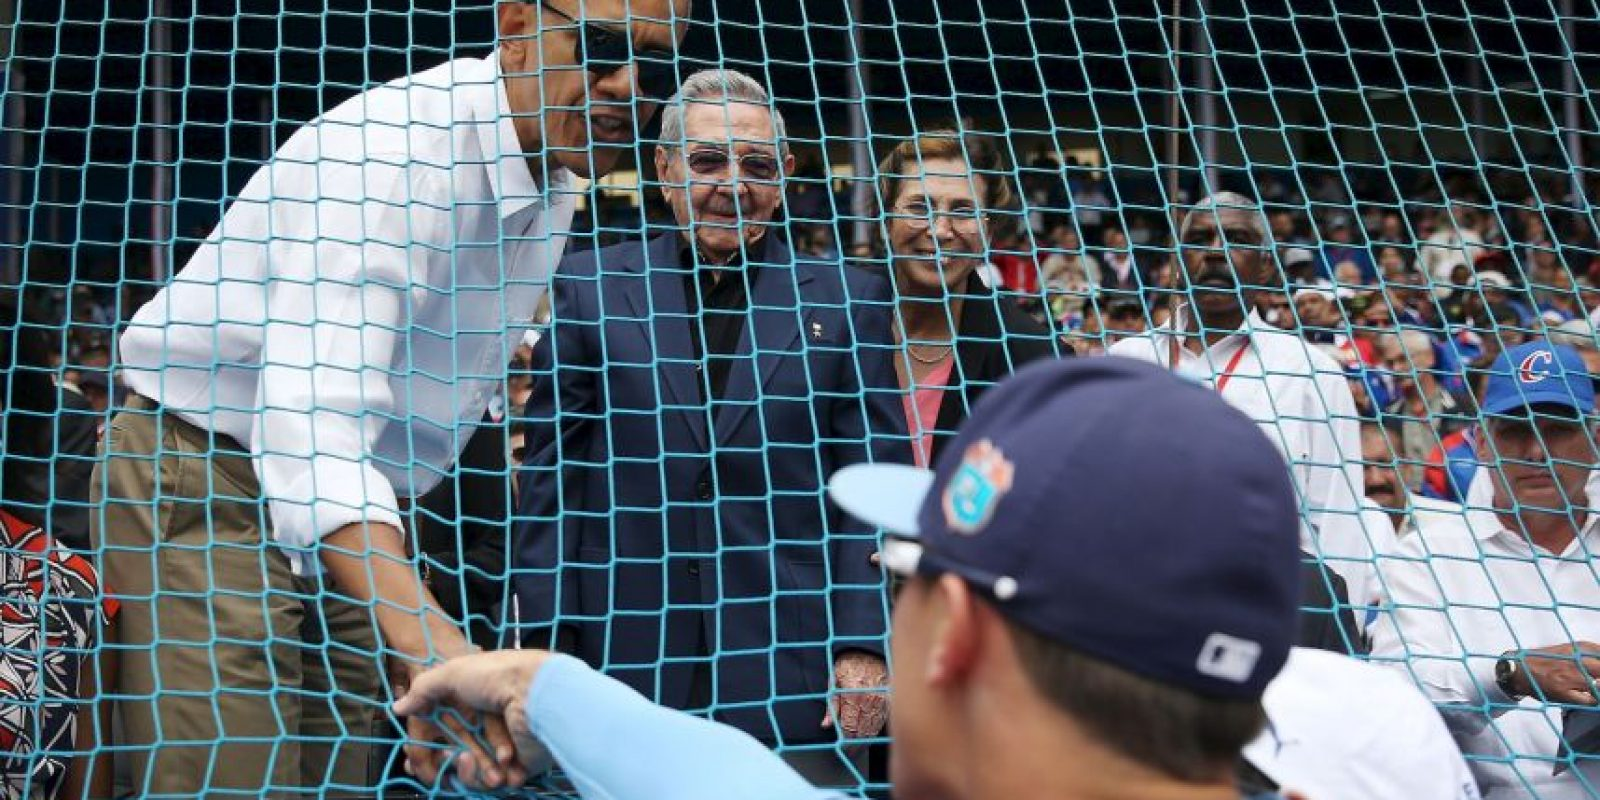 Antes de partir de Cuba, el martes 22 de marzo Obama acudió a un juego de béisbol junto a su familia. Foto:Getty Images